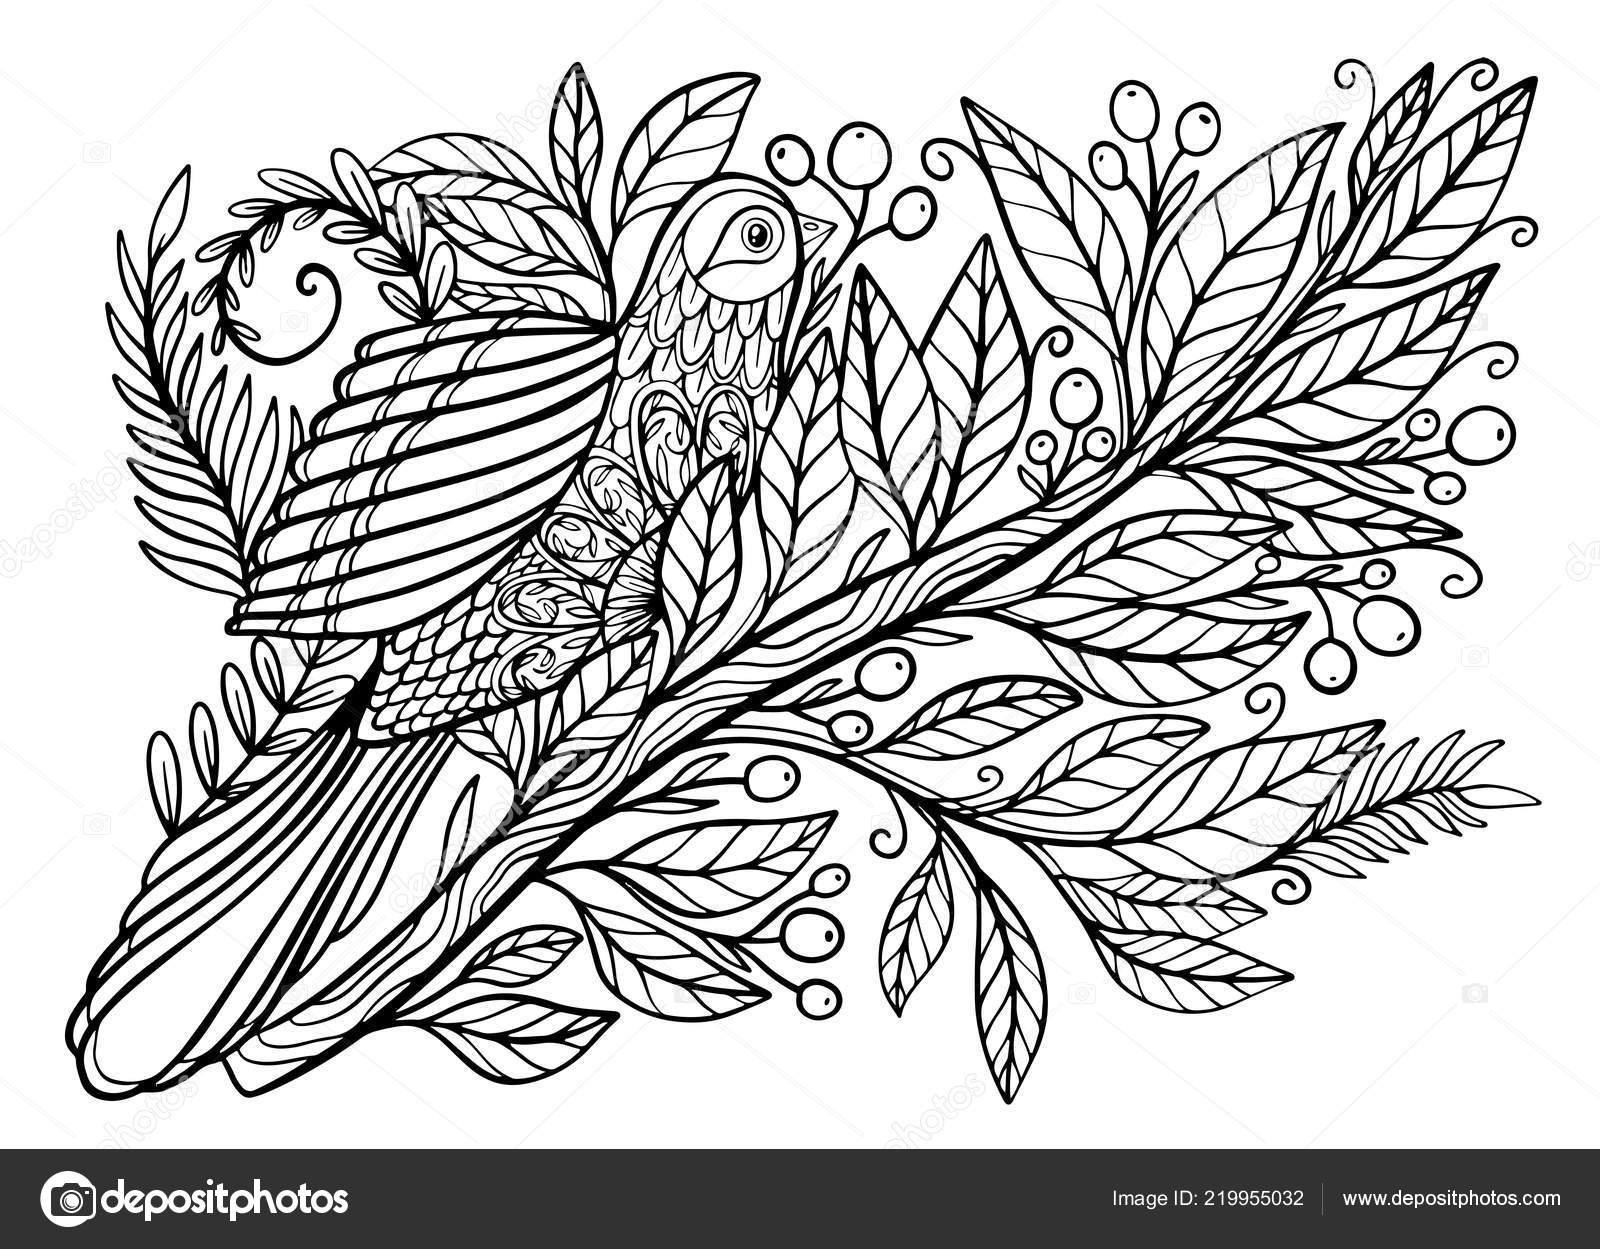 Dibujos Para Colorear Libro Para Colorear Para Adultos Bonita